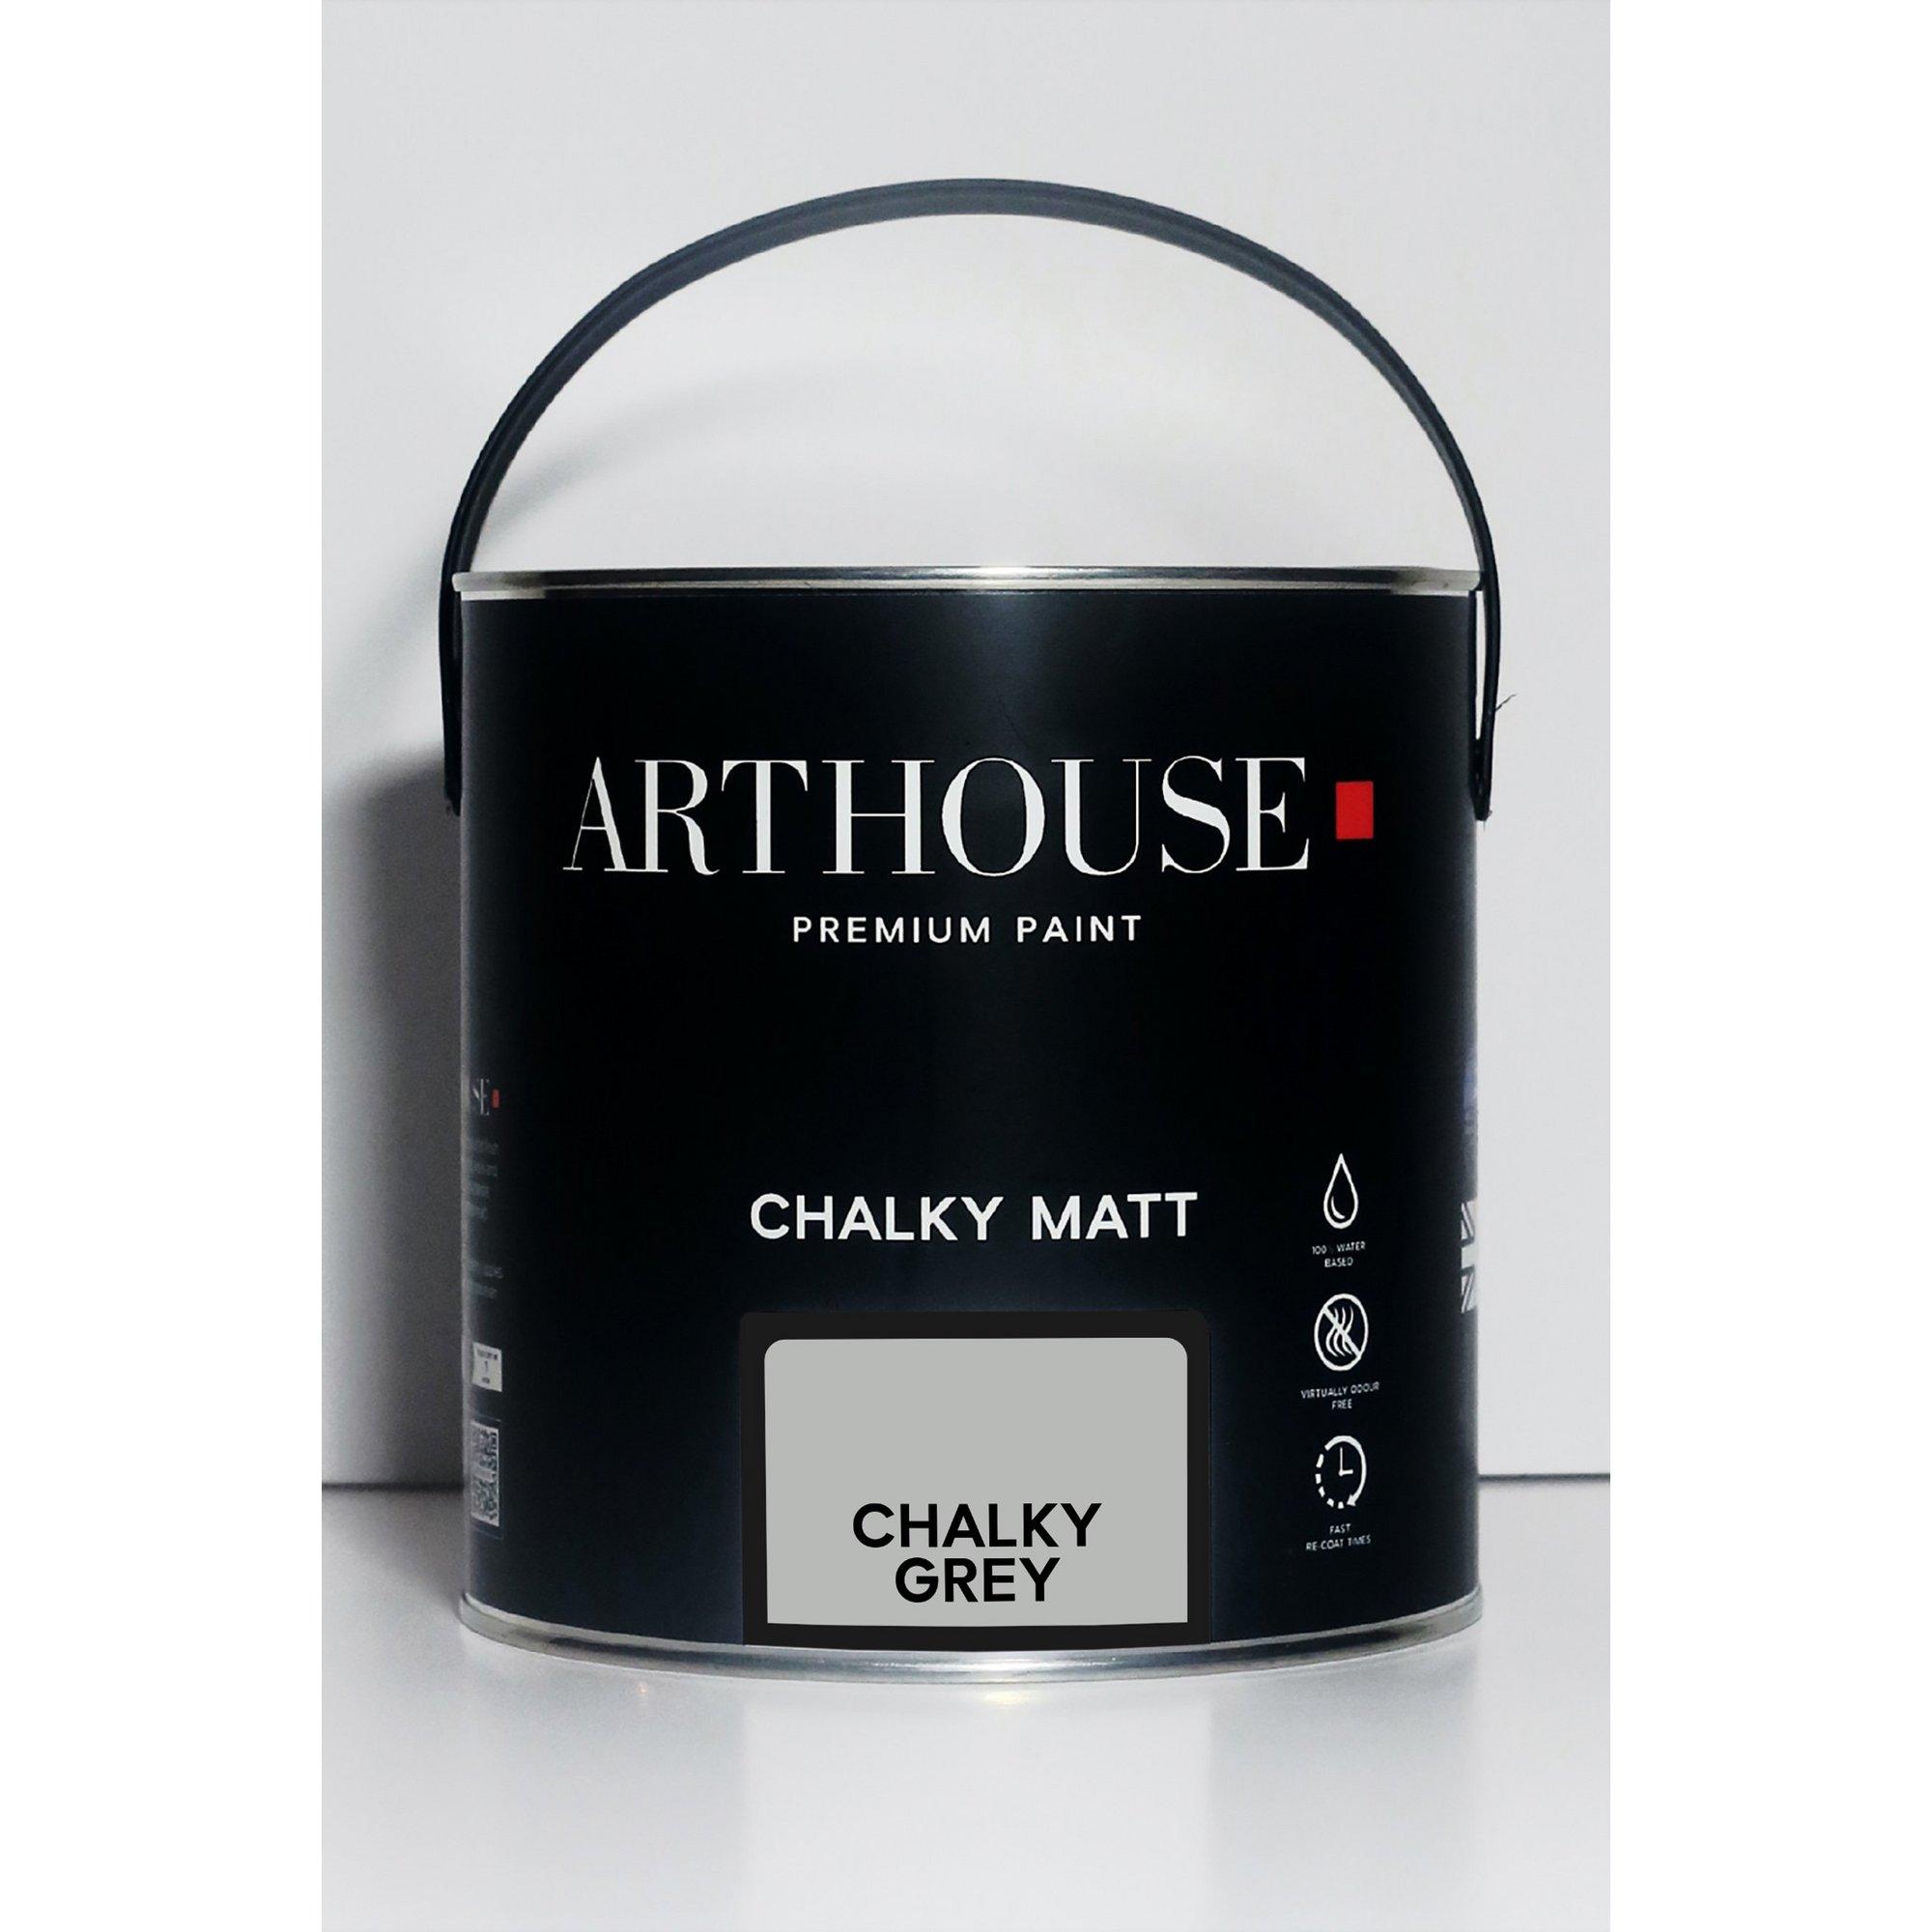 Image of Chalky Matt Grey Emulsion Paint